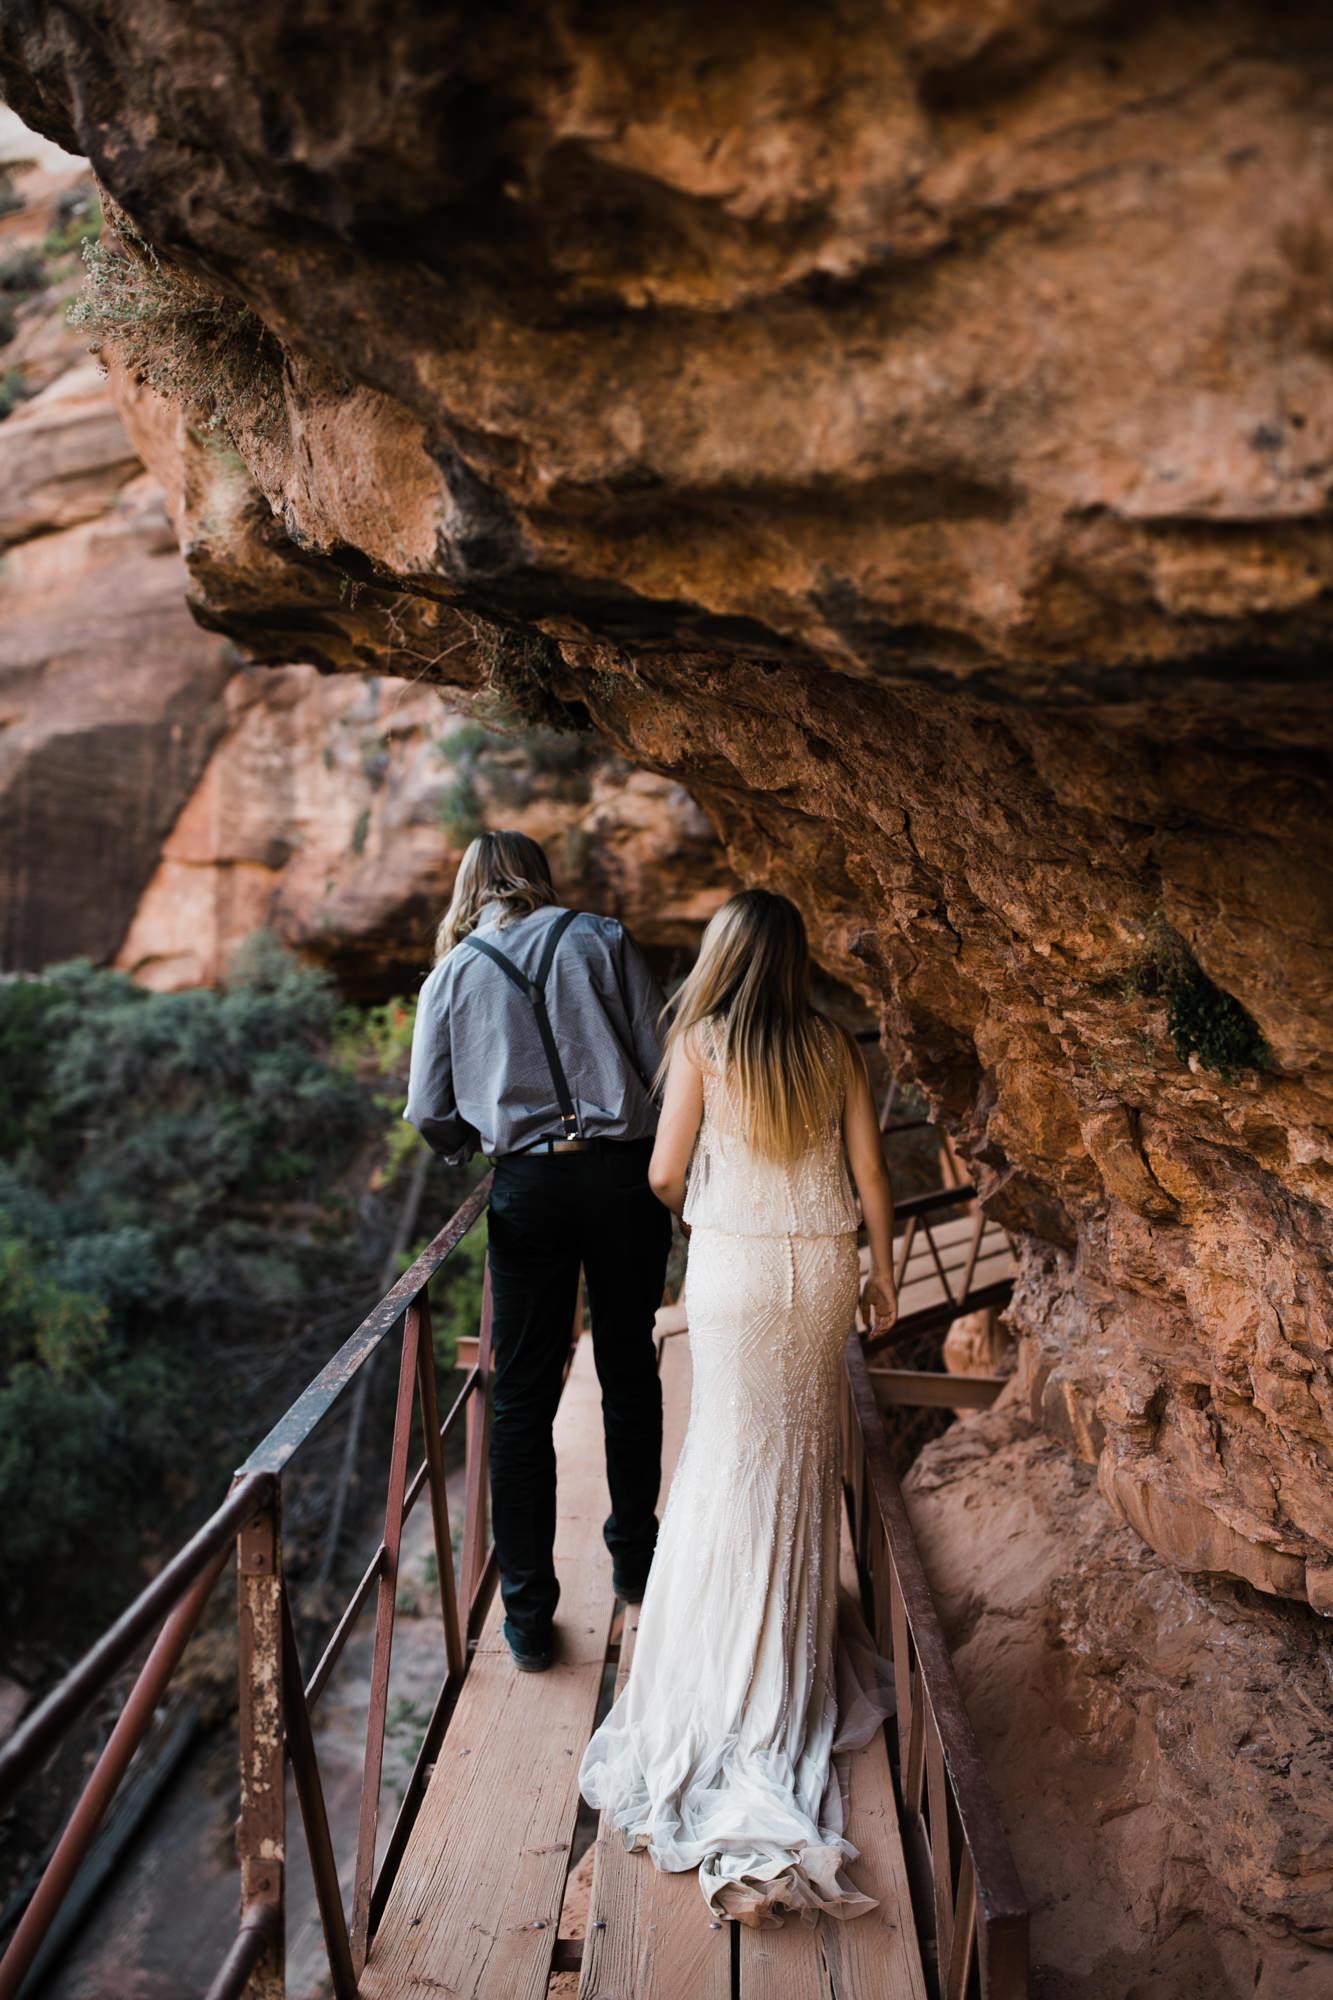 hiking elopement in zion national park | destination adventure wedding photographers | the hearnes adventure photography | www.thehearnes.com